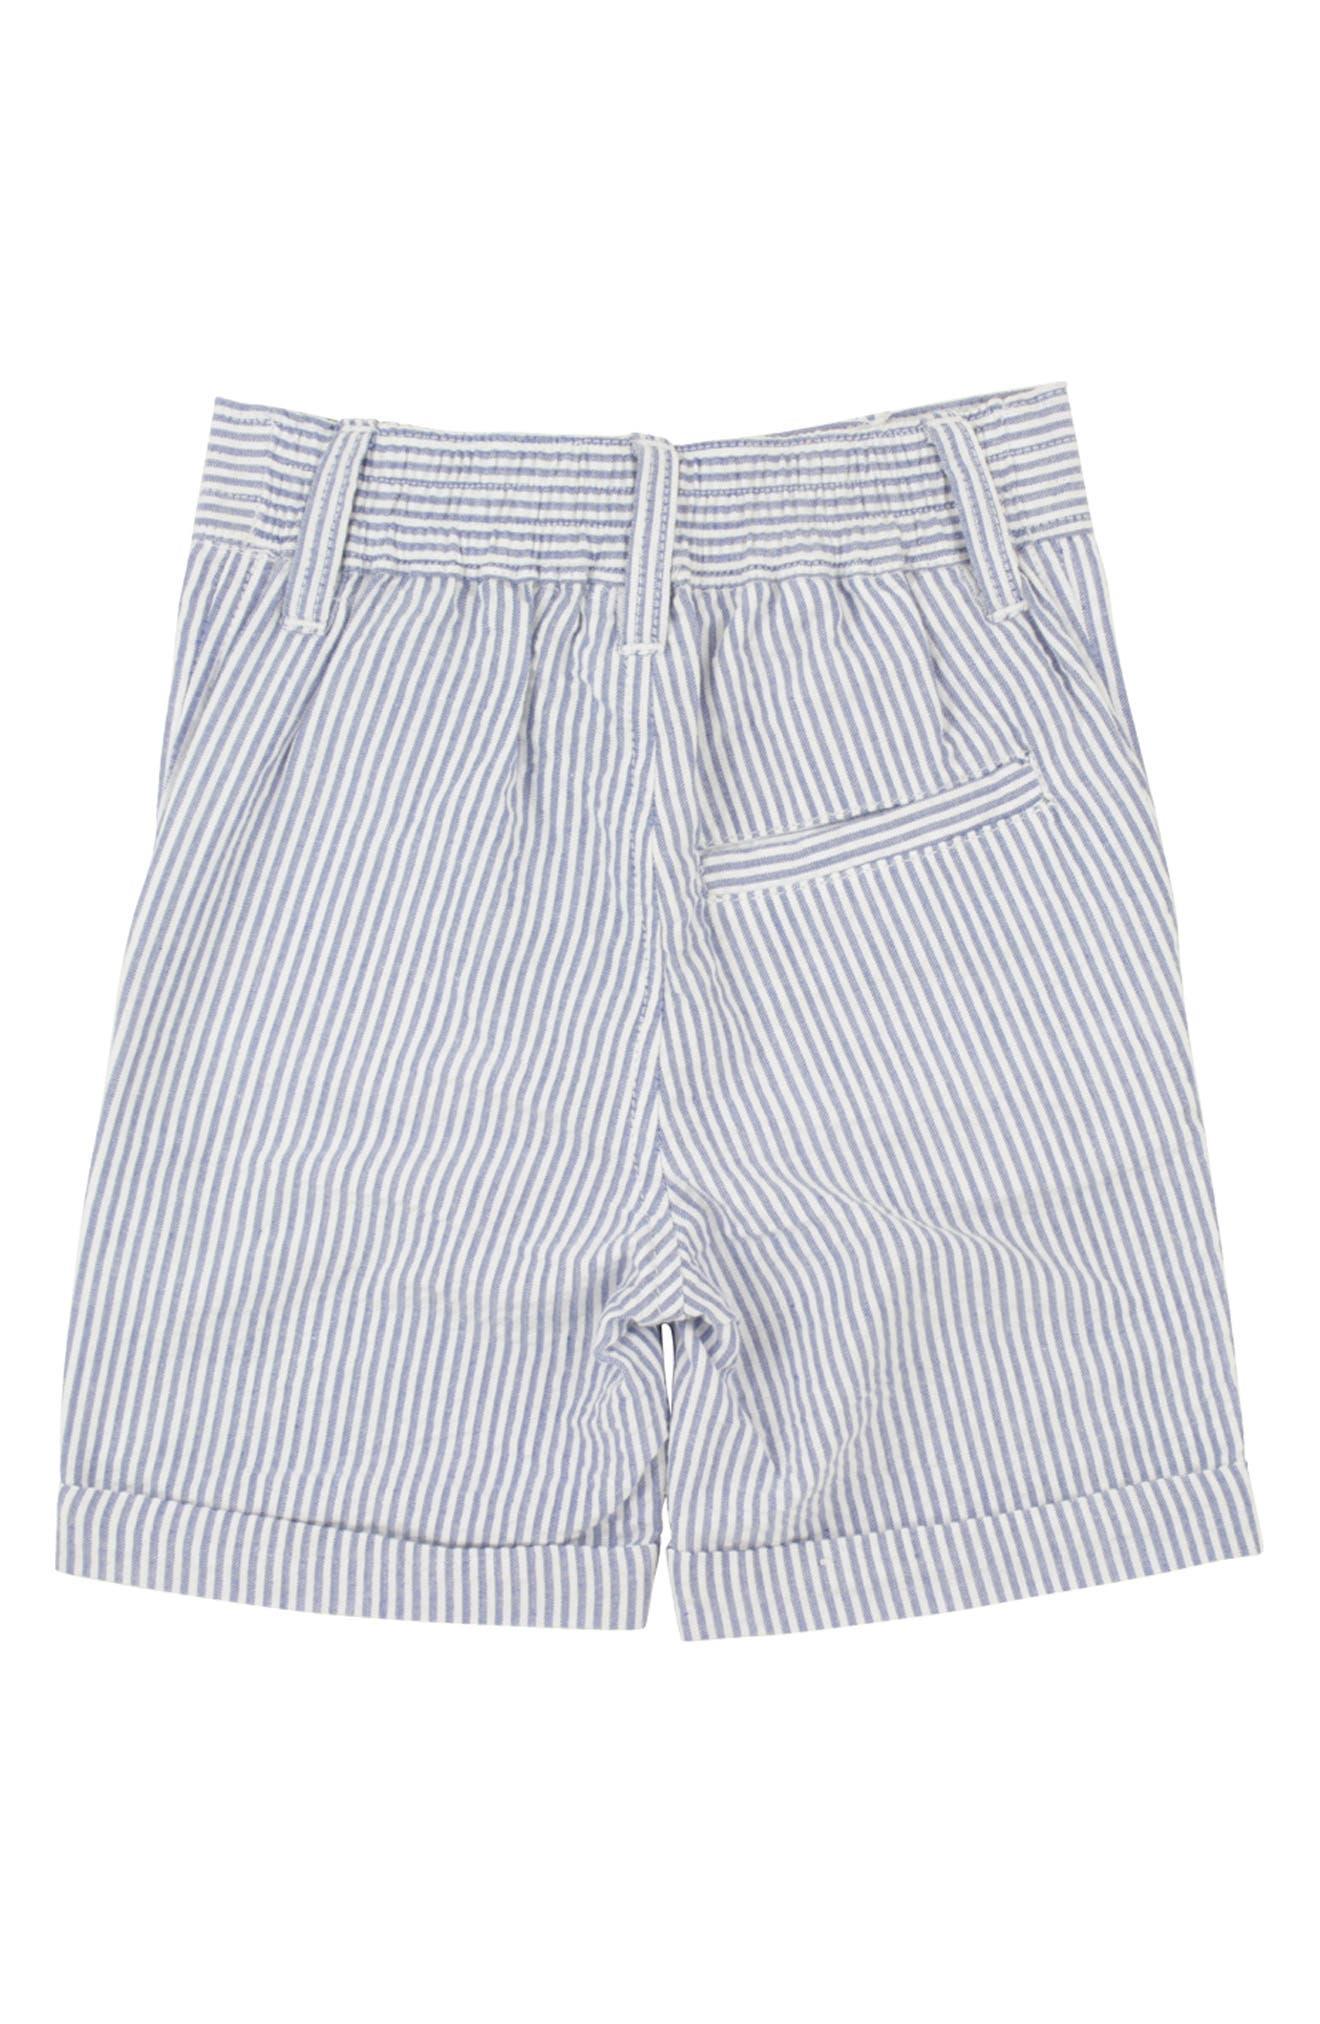 RUGGEDBUTTS, Seersucker Vest & Shorts Set, Alternate thumbnail 3, color, BLUE